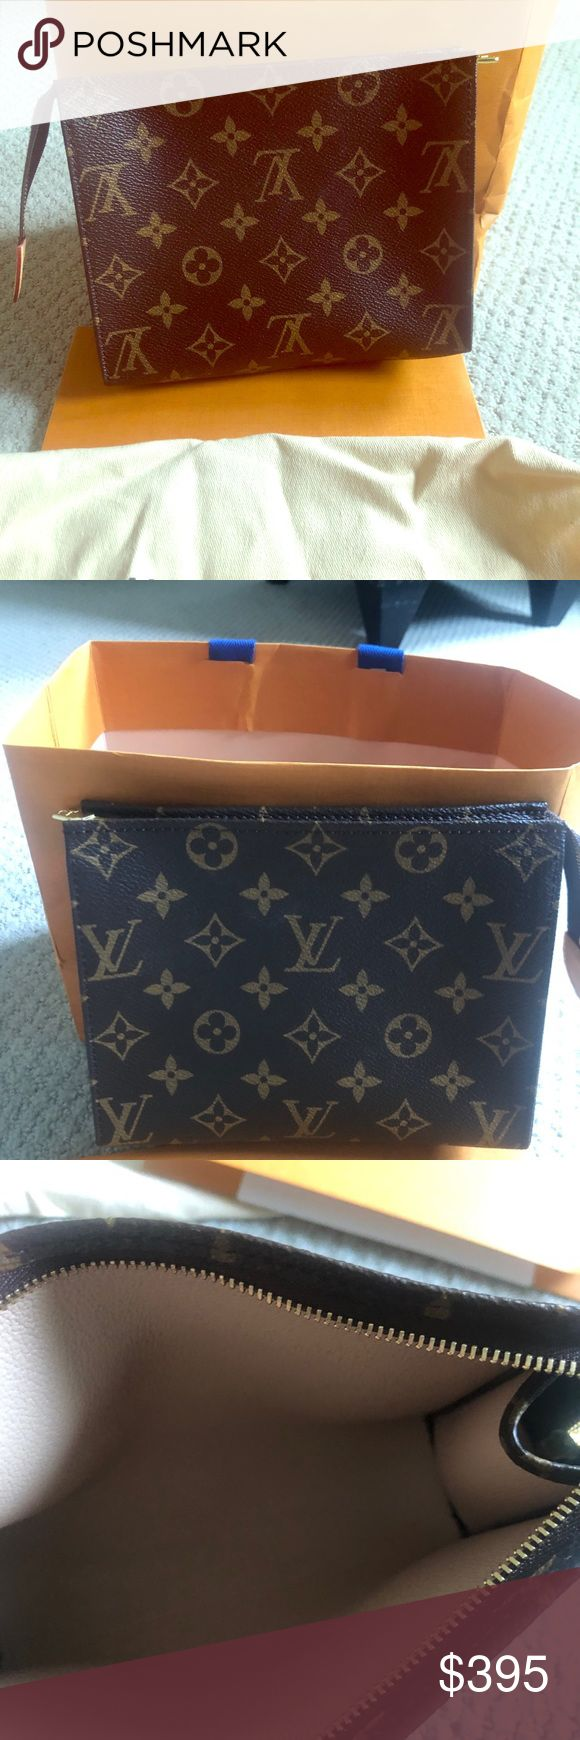 Louis Vuitton cosmetic bag new NWT Louis vuitton